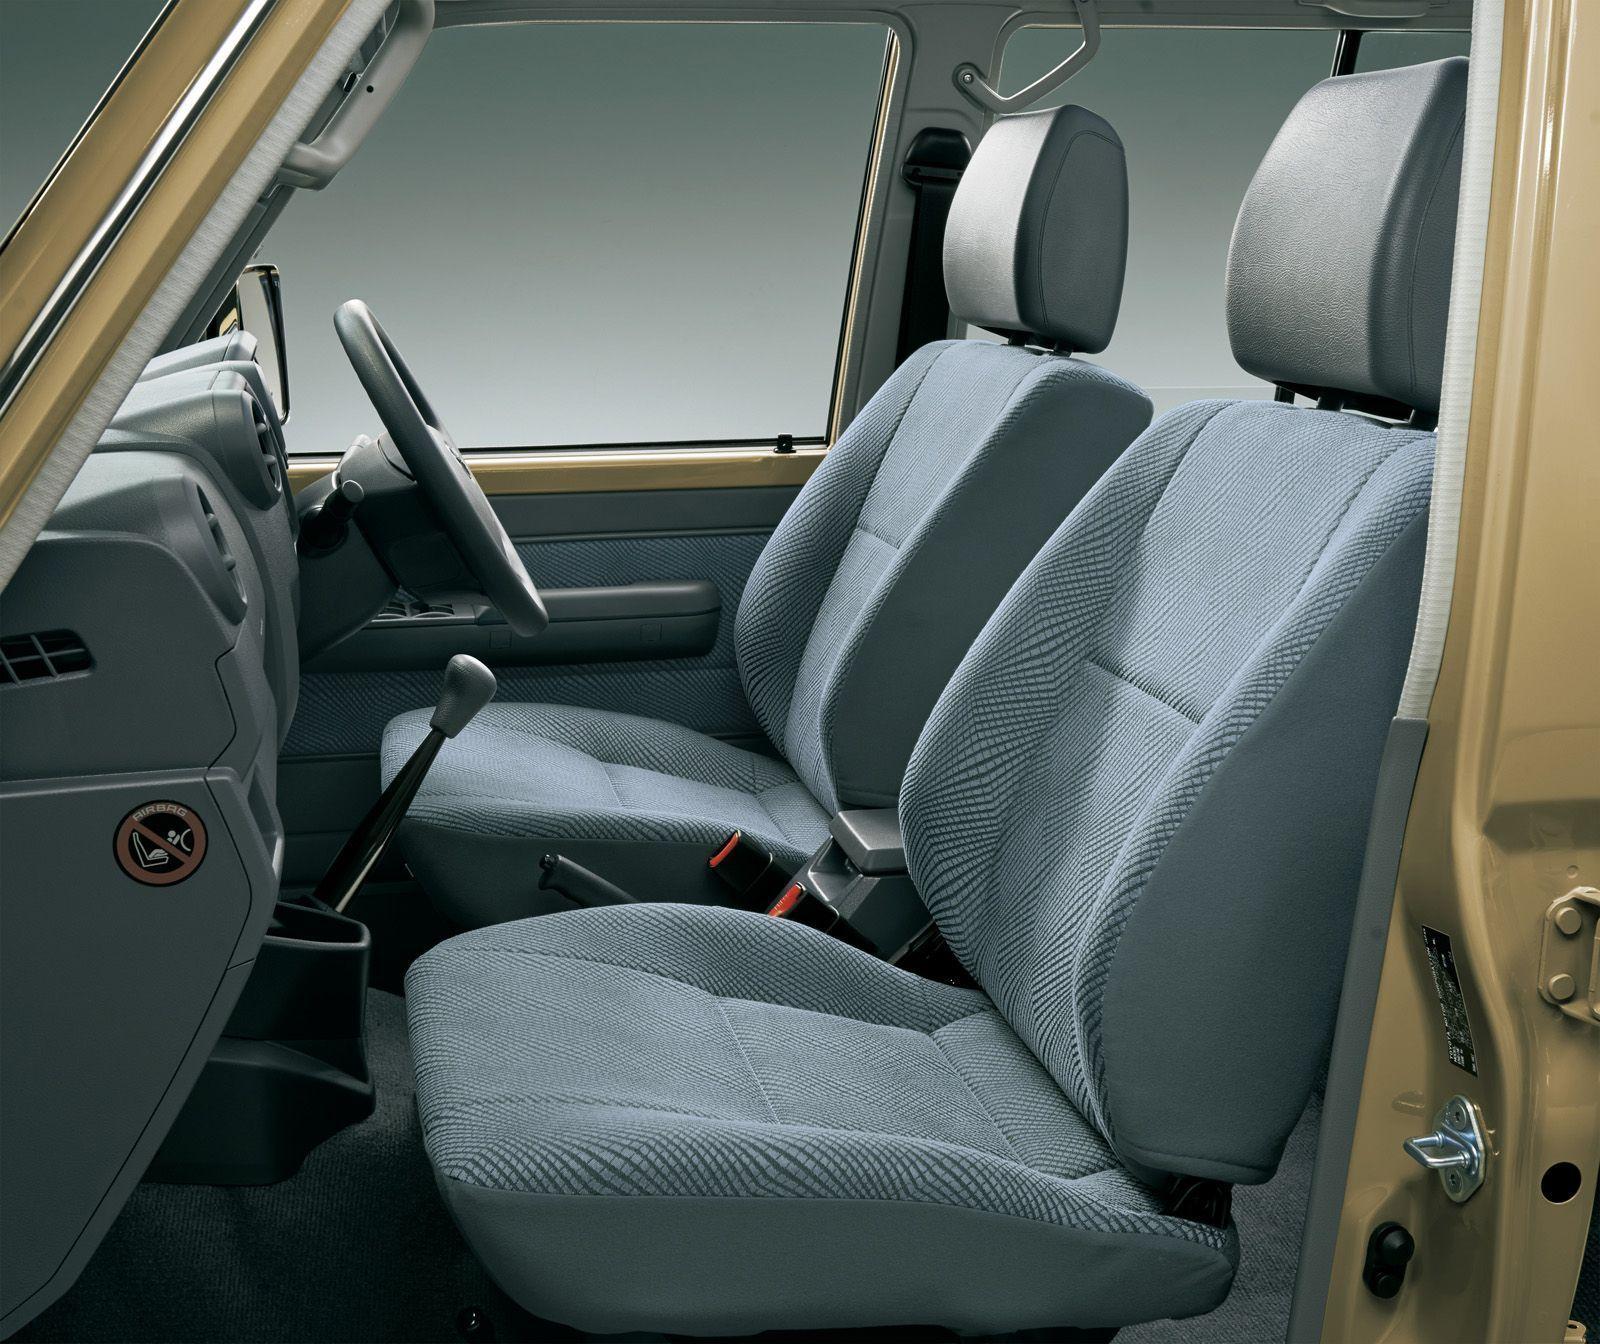 Toyota-Land-Cruiser-70-Series-10